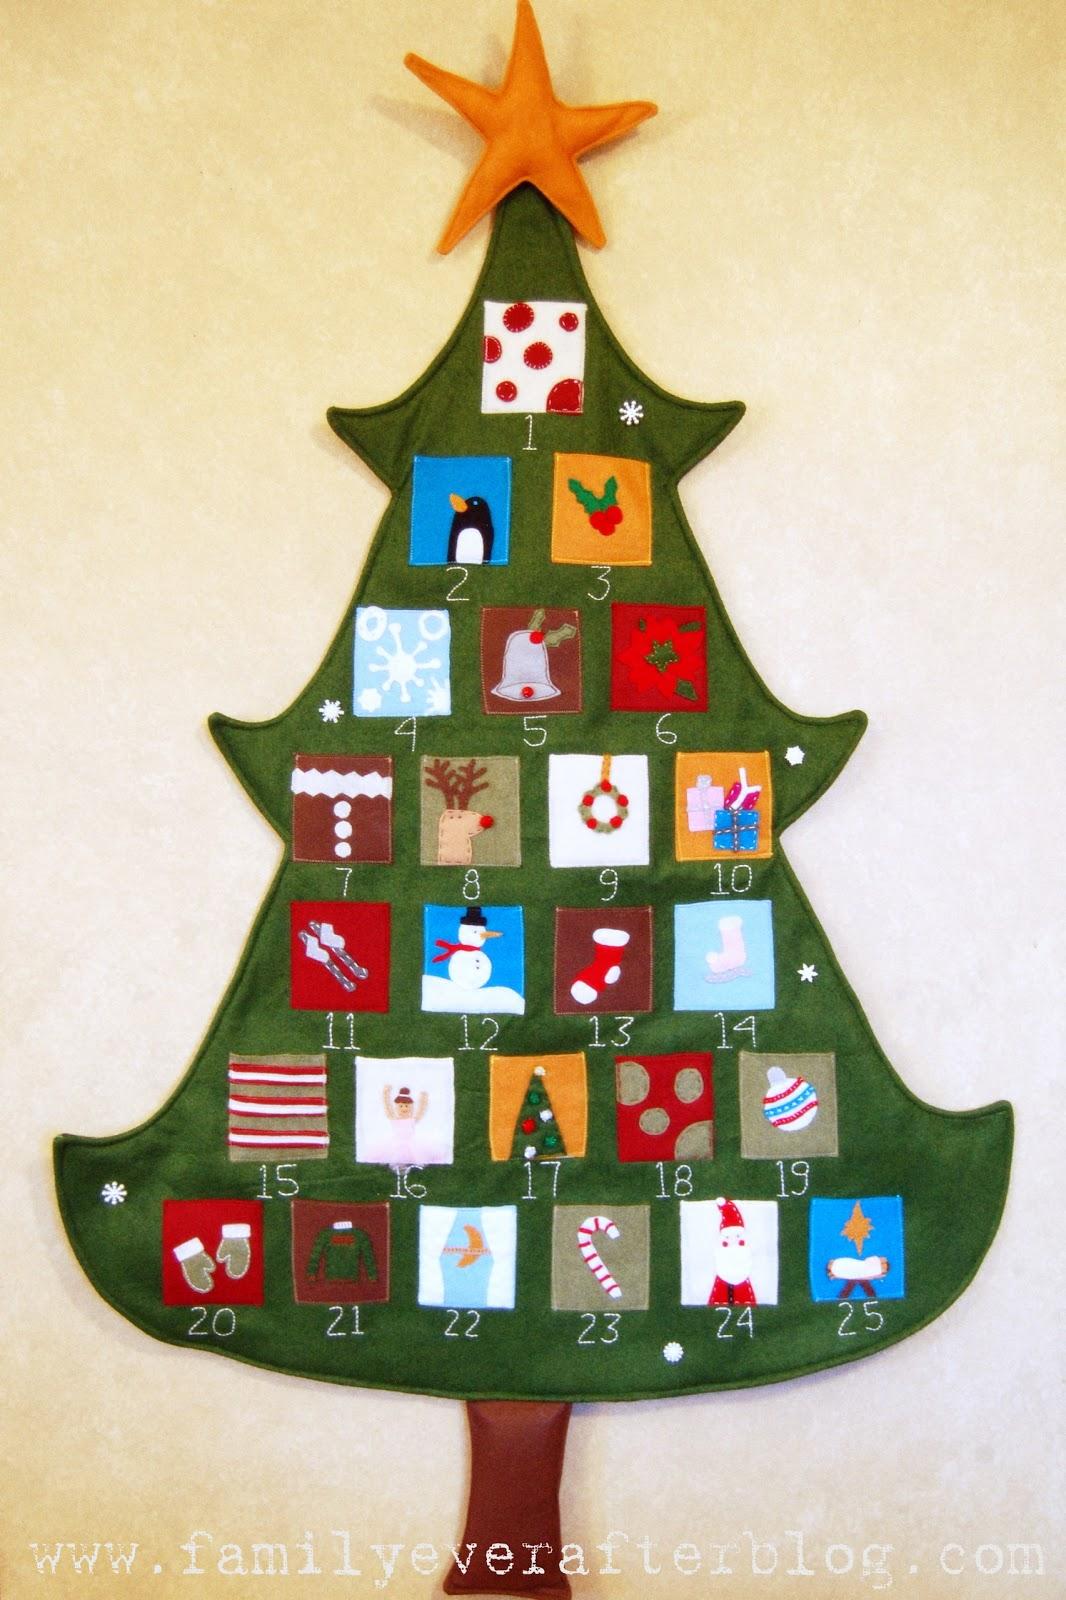 Diy Advent Calendar Tree : Felt advent calendar family ever after sugar bee crafts